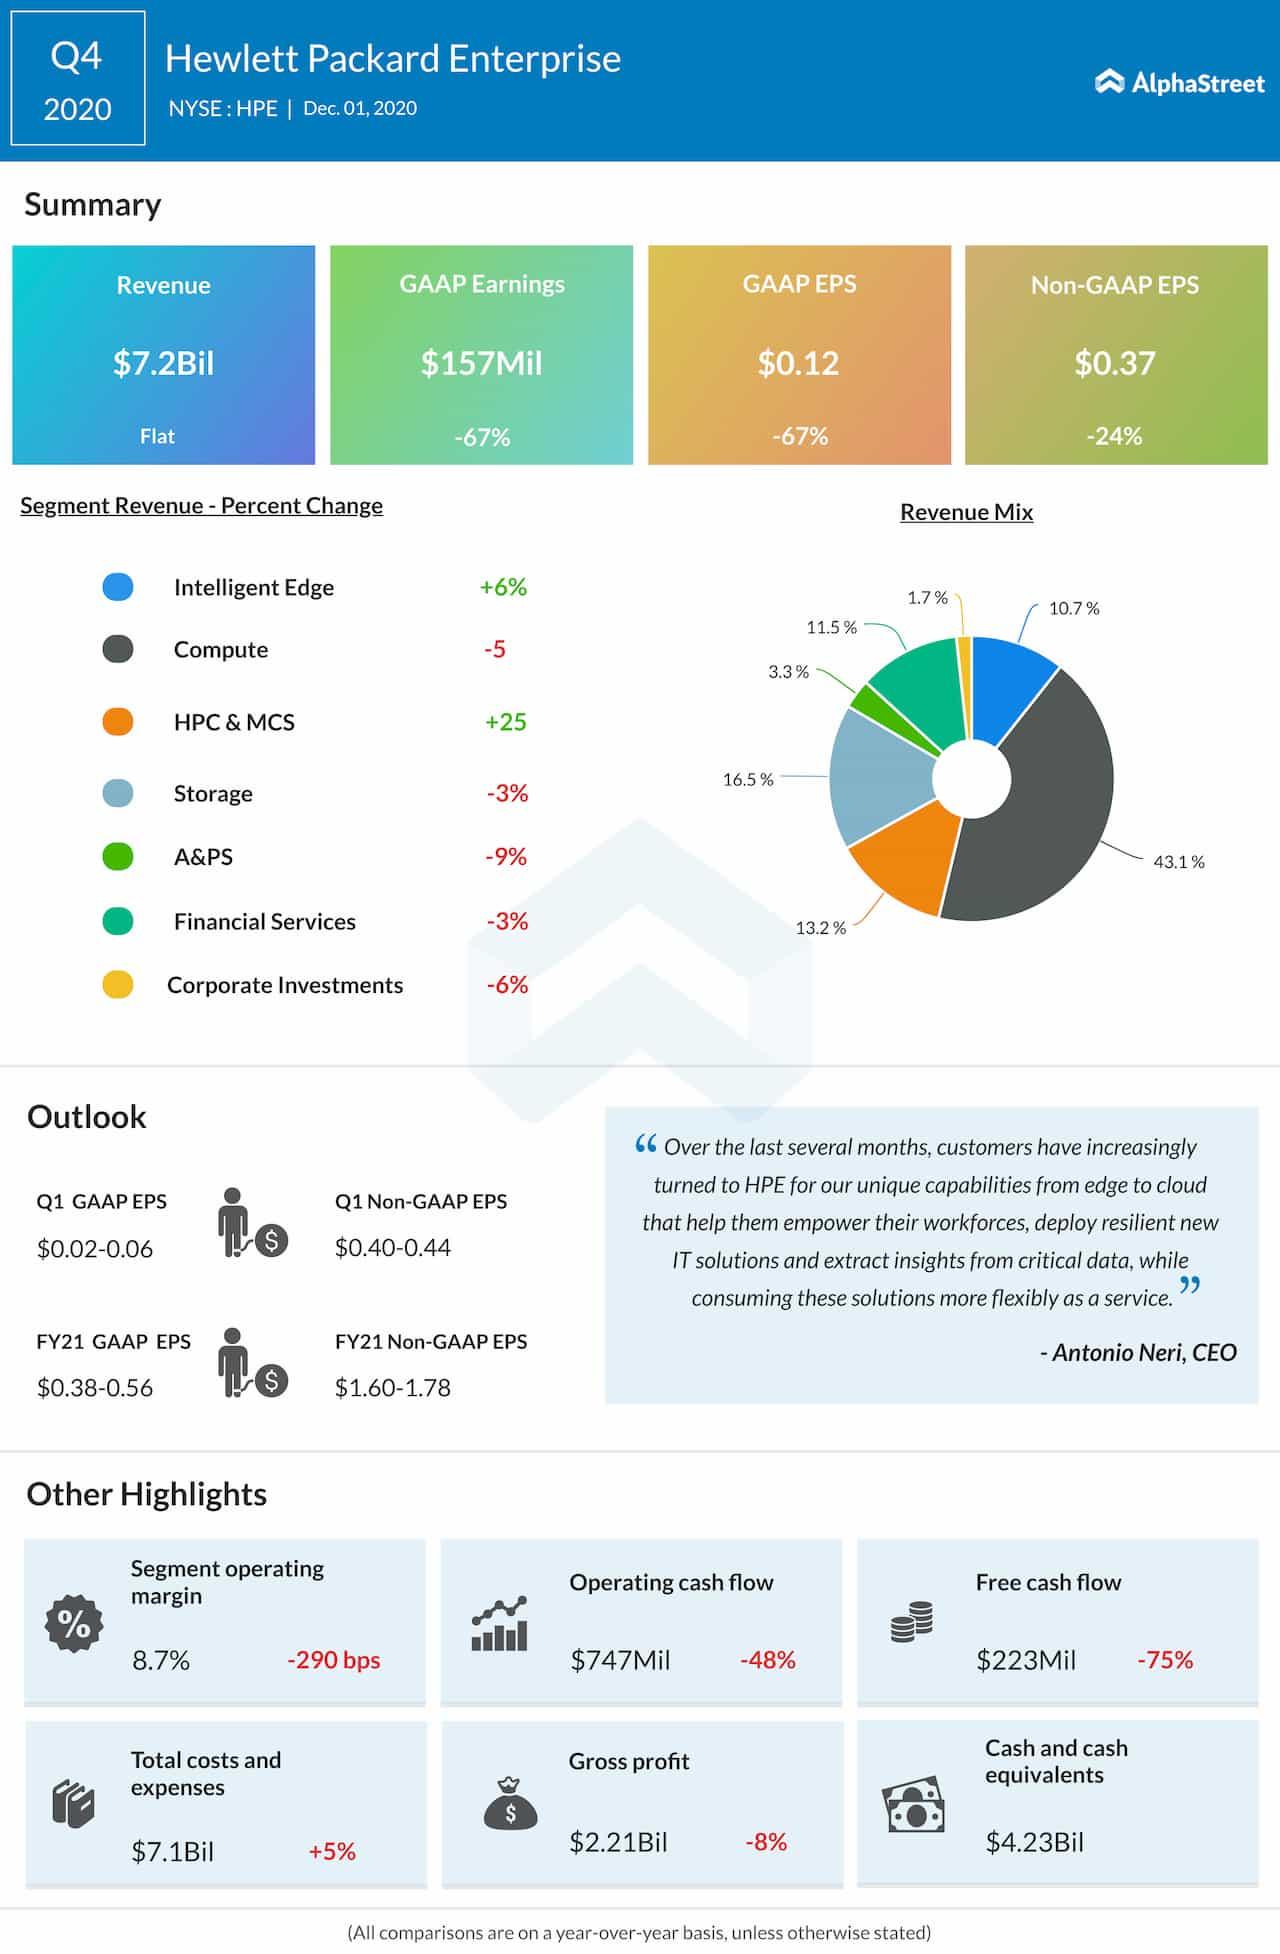 Hewlett Packard Q4 2020 Earnings Infographic